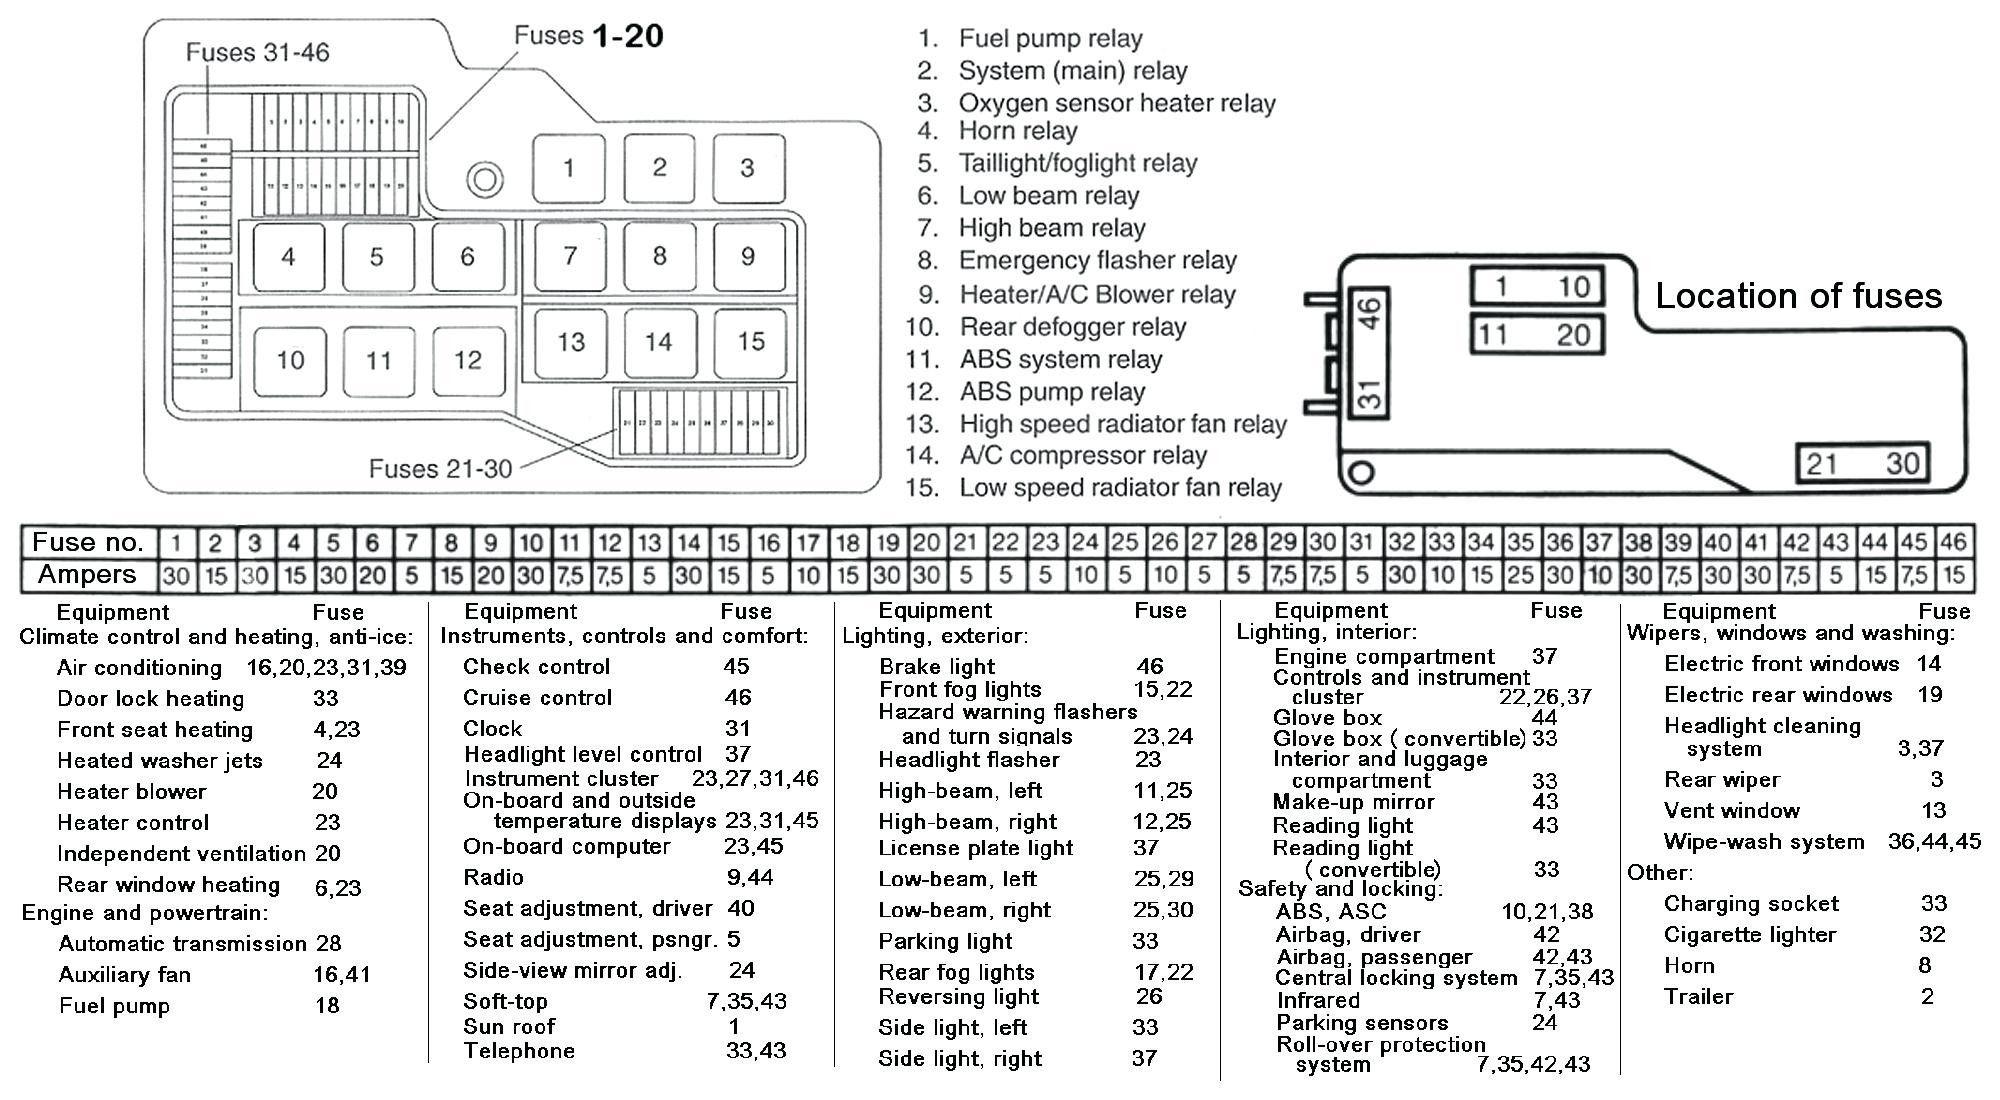 2001 bmw x5 wiring diagram bmw 325i diagram wiring diagram e6  bmw 325i diagram wiring diagram e6